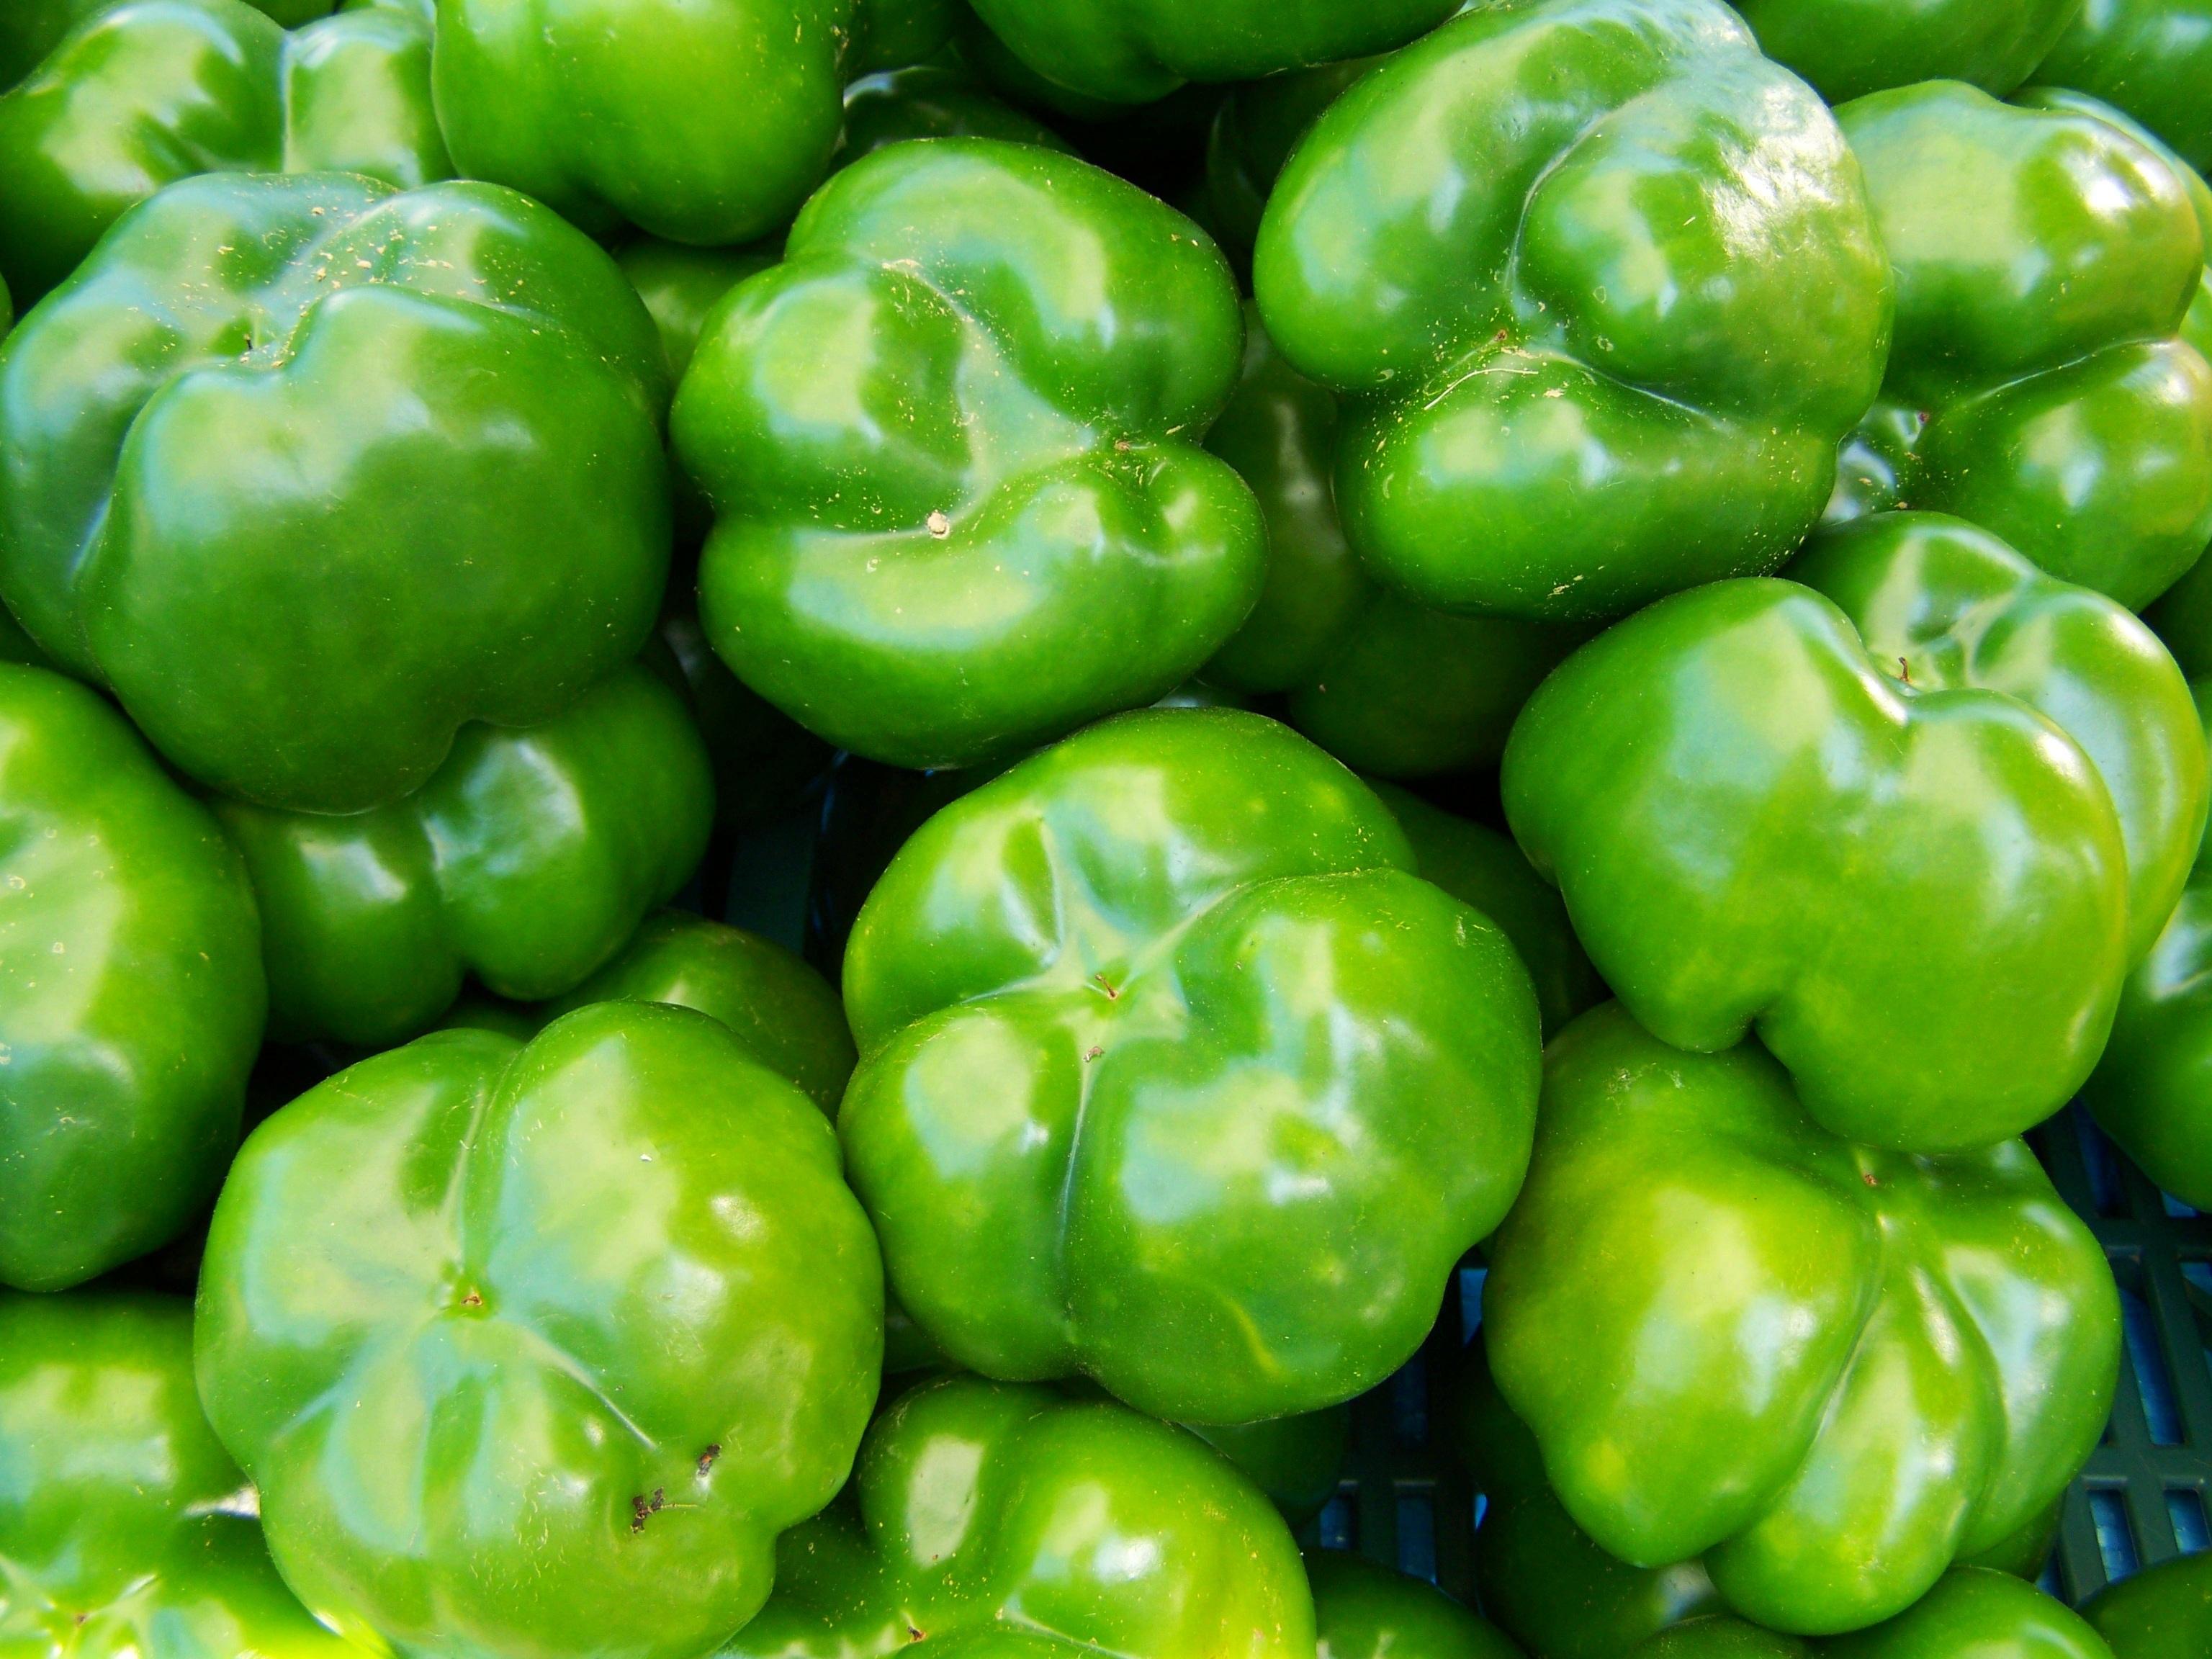 Free Images : fruit, food, green, produce, vegetable, vegetables, bell pepper, flowering plant, jalapeno, chili pepper, land plant, bird's eye chili, ...